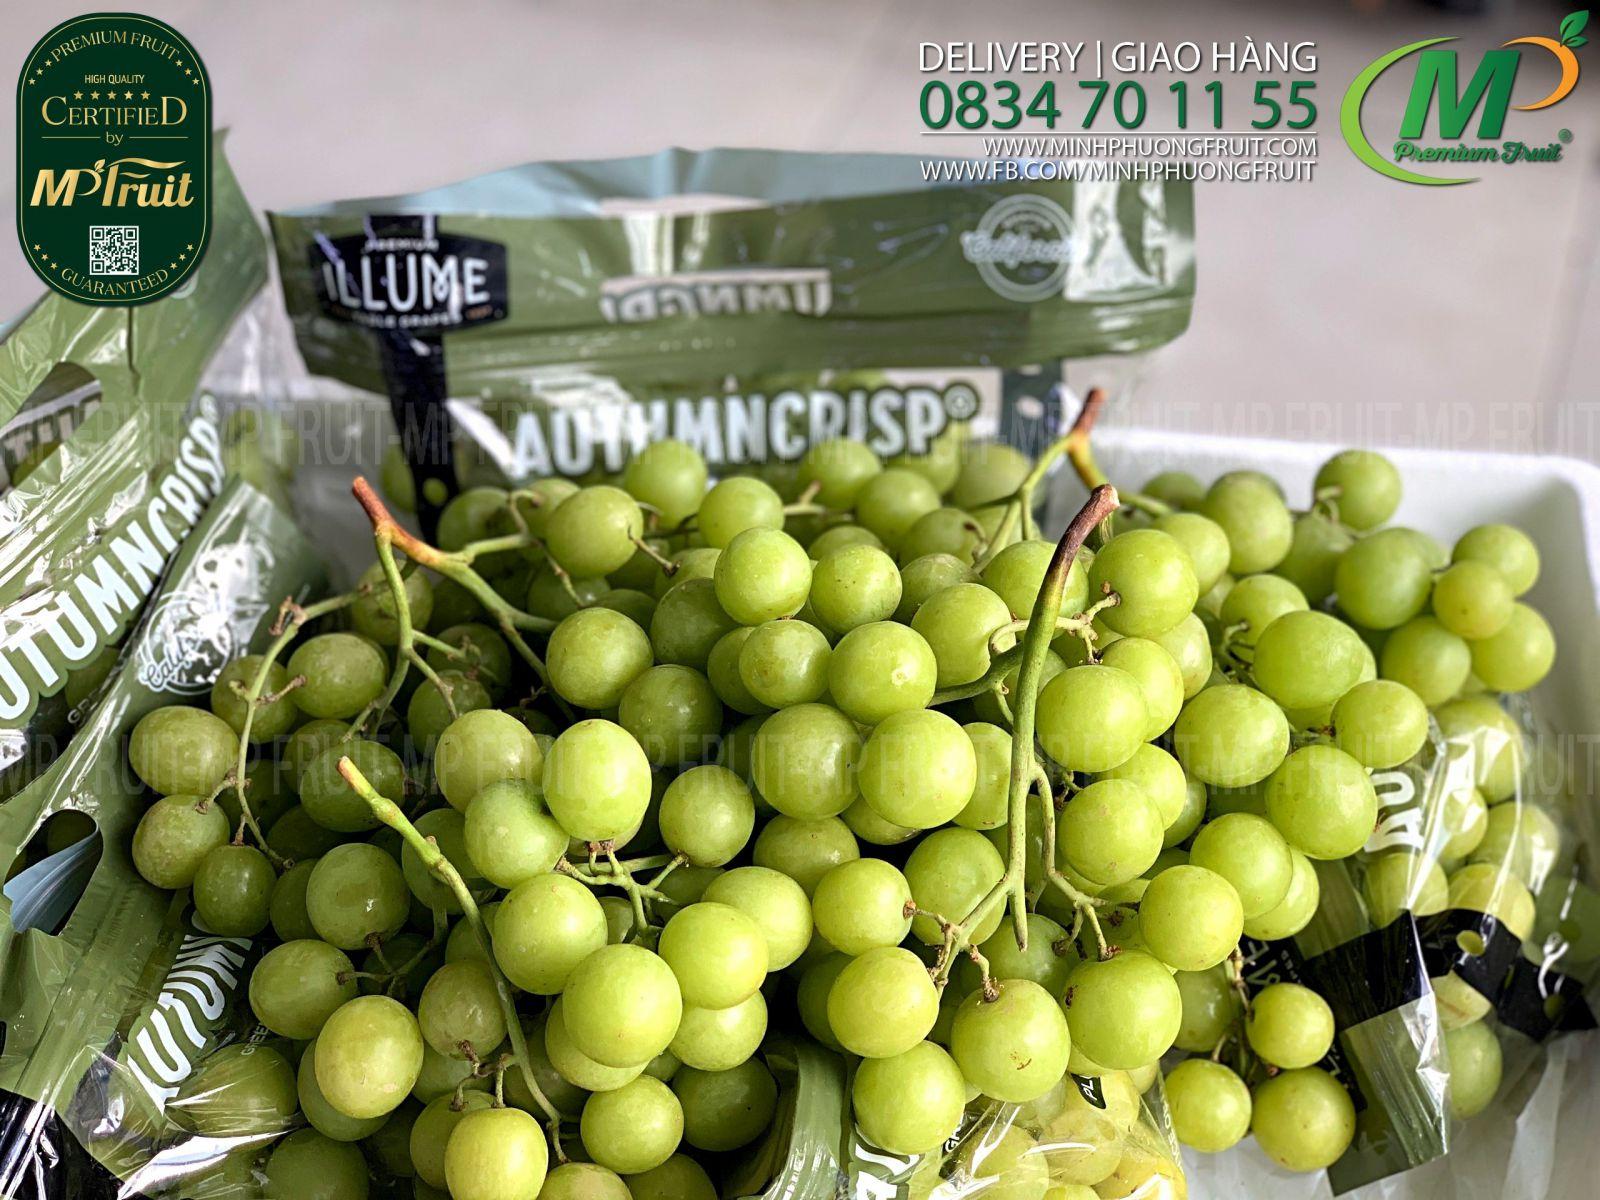 Nho Xanh Autumn Crisp iLLume Mỹ tại MP Fruits